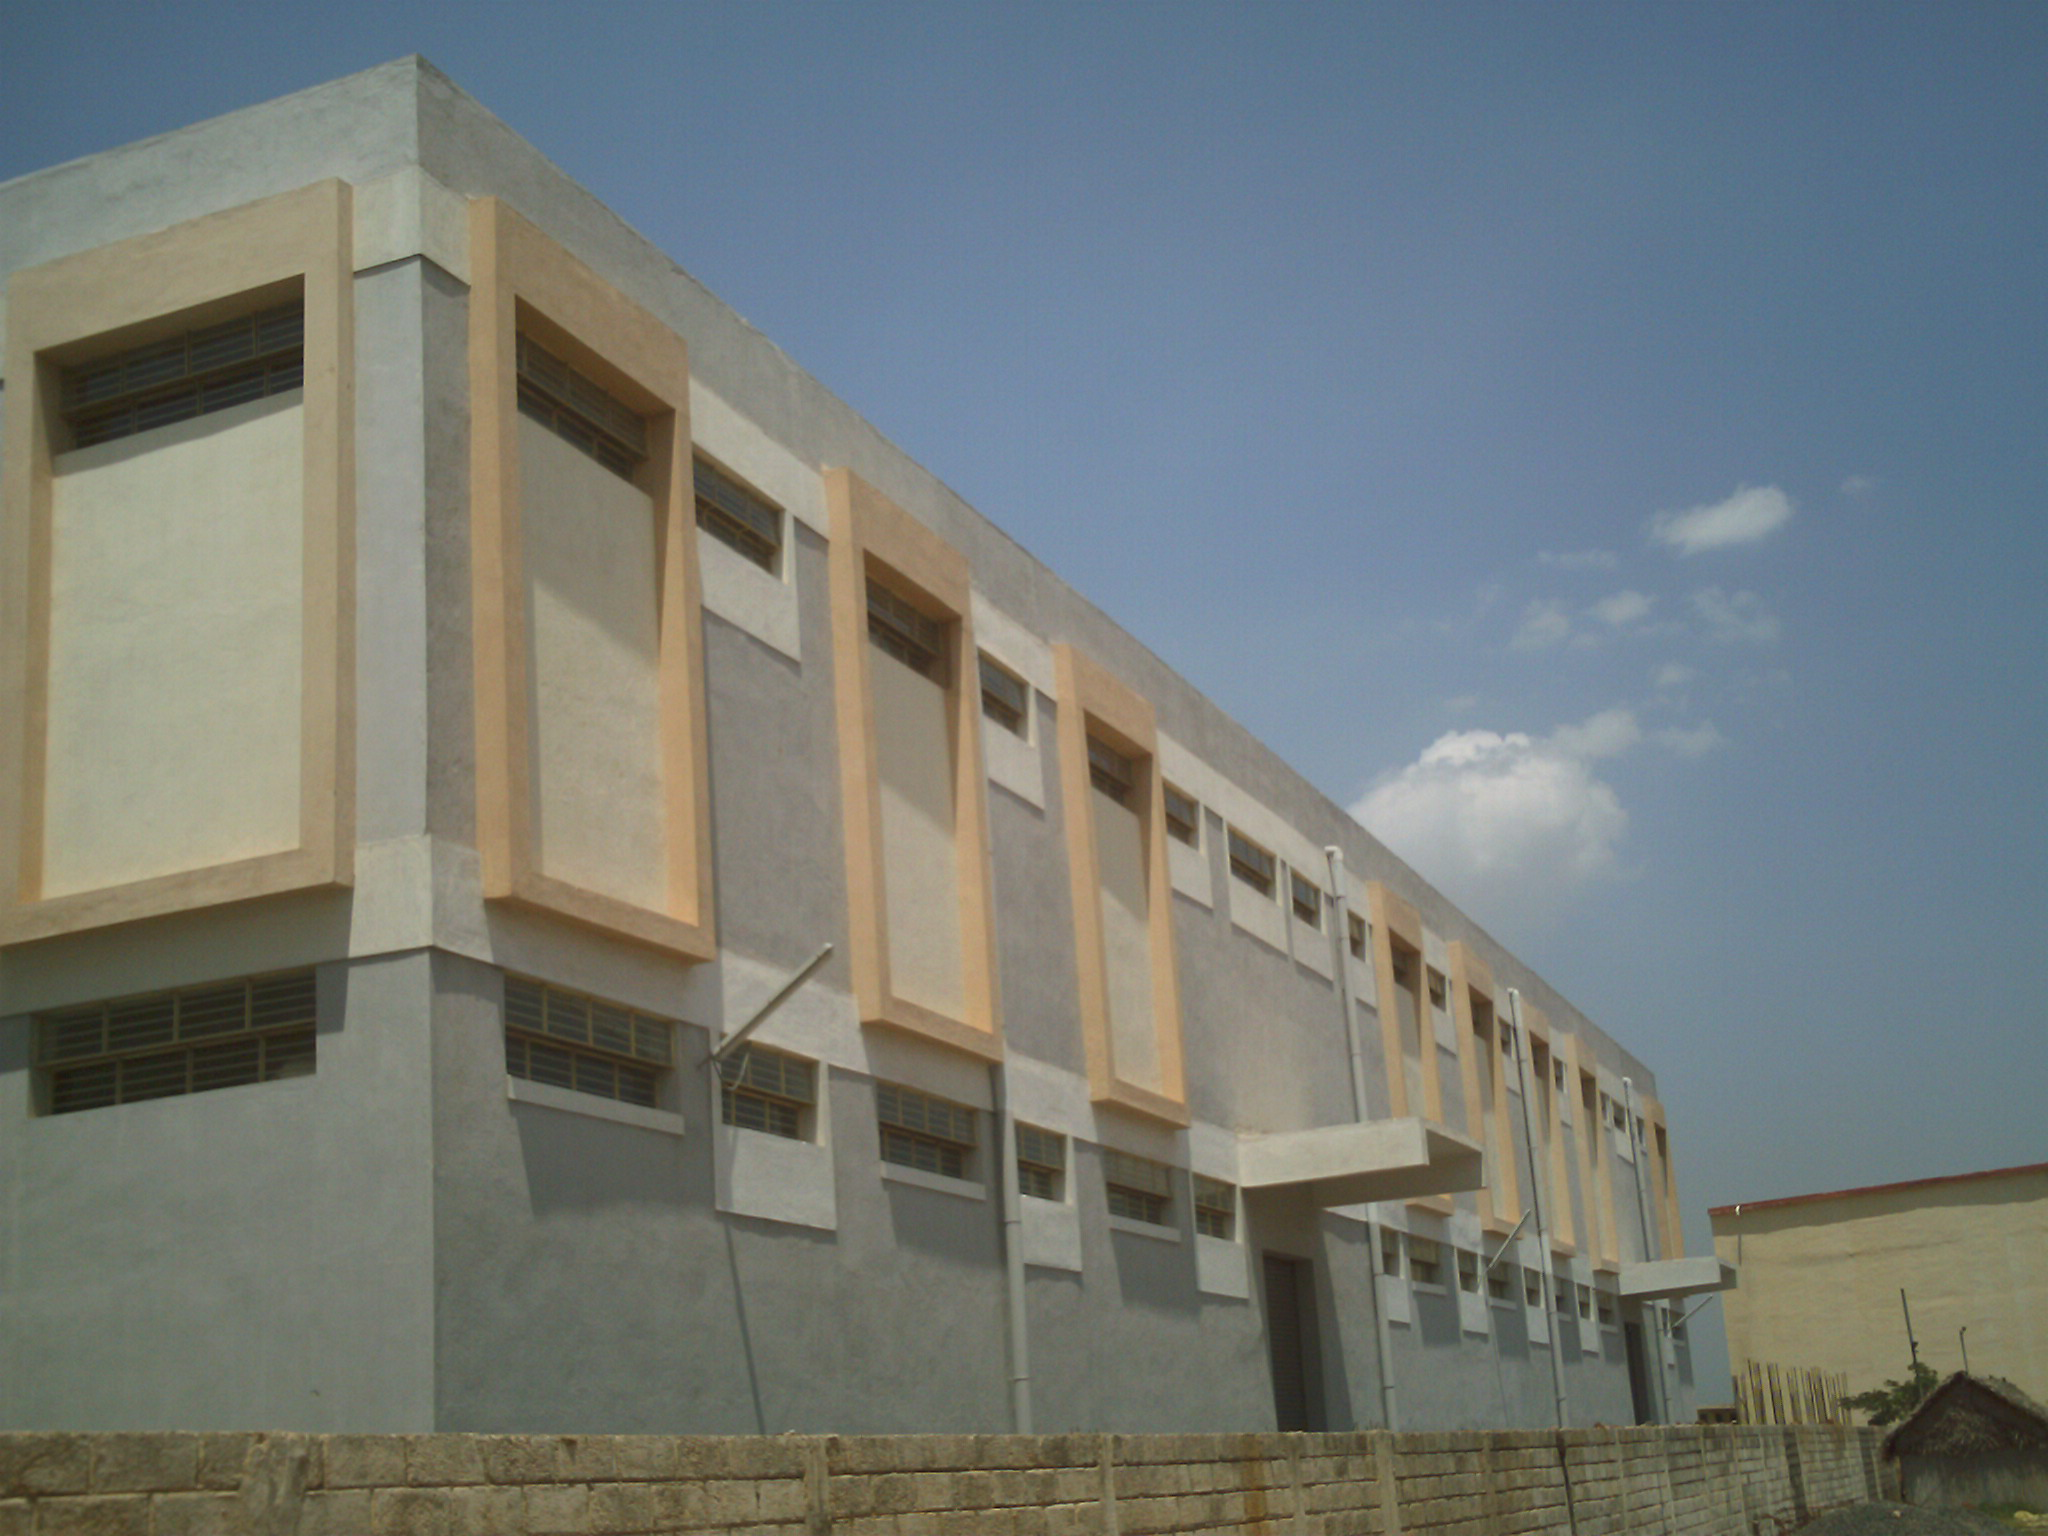 Warehouse Constrution